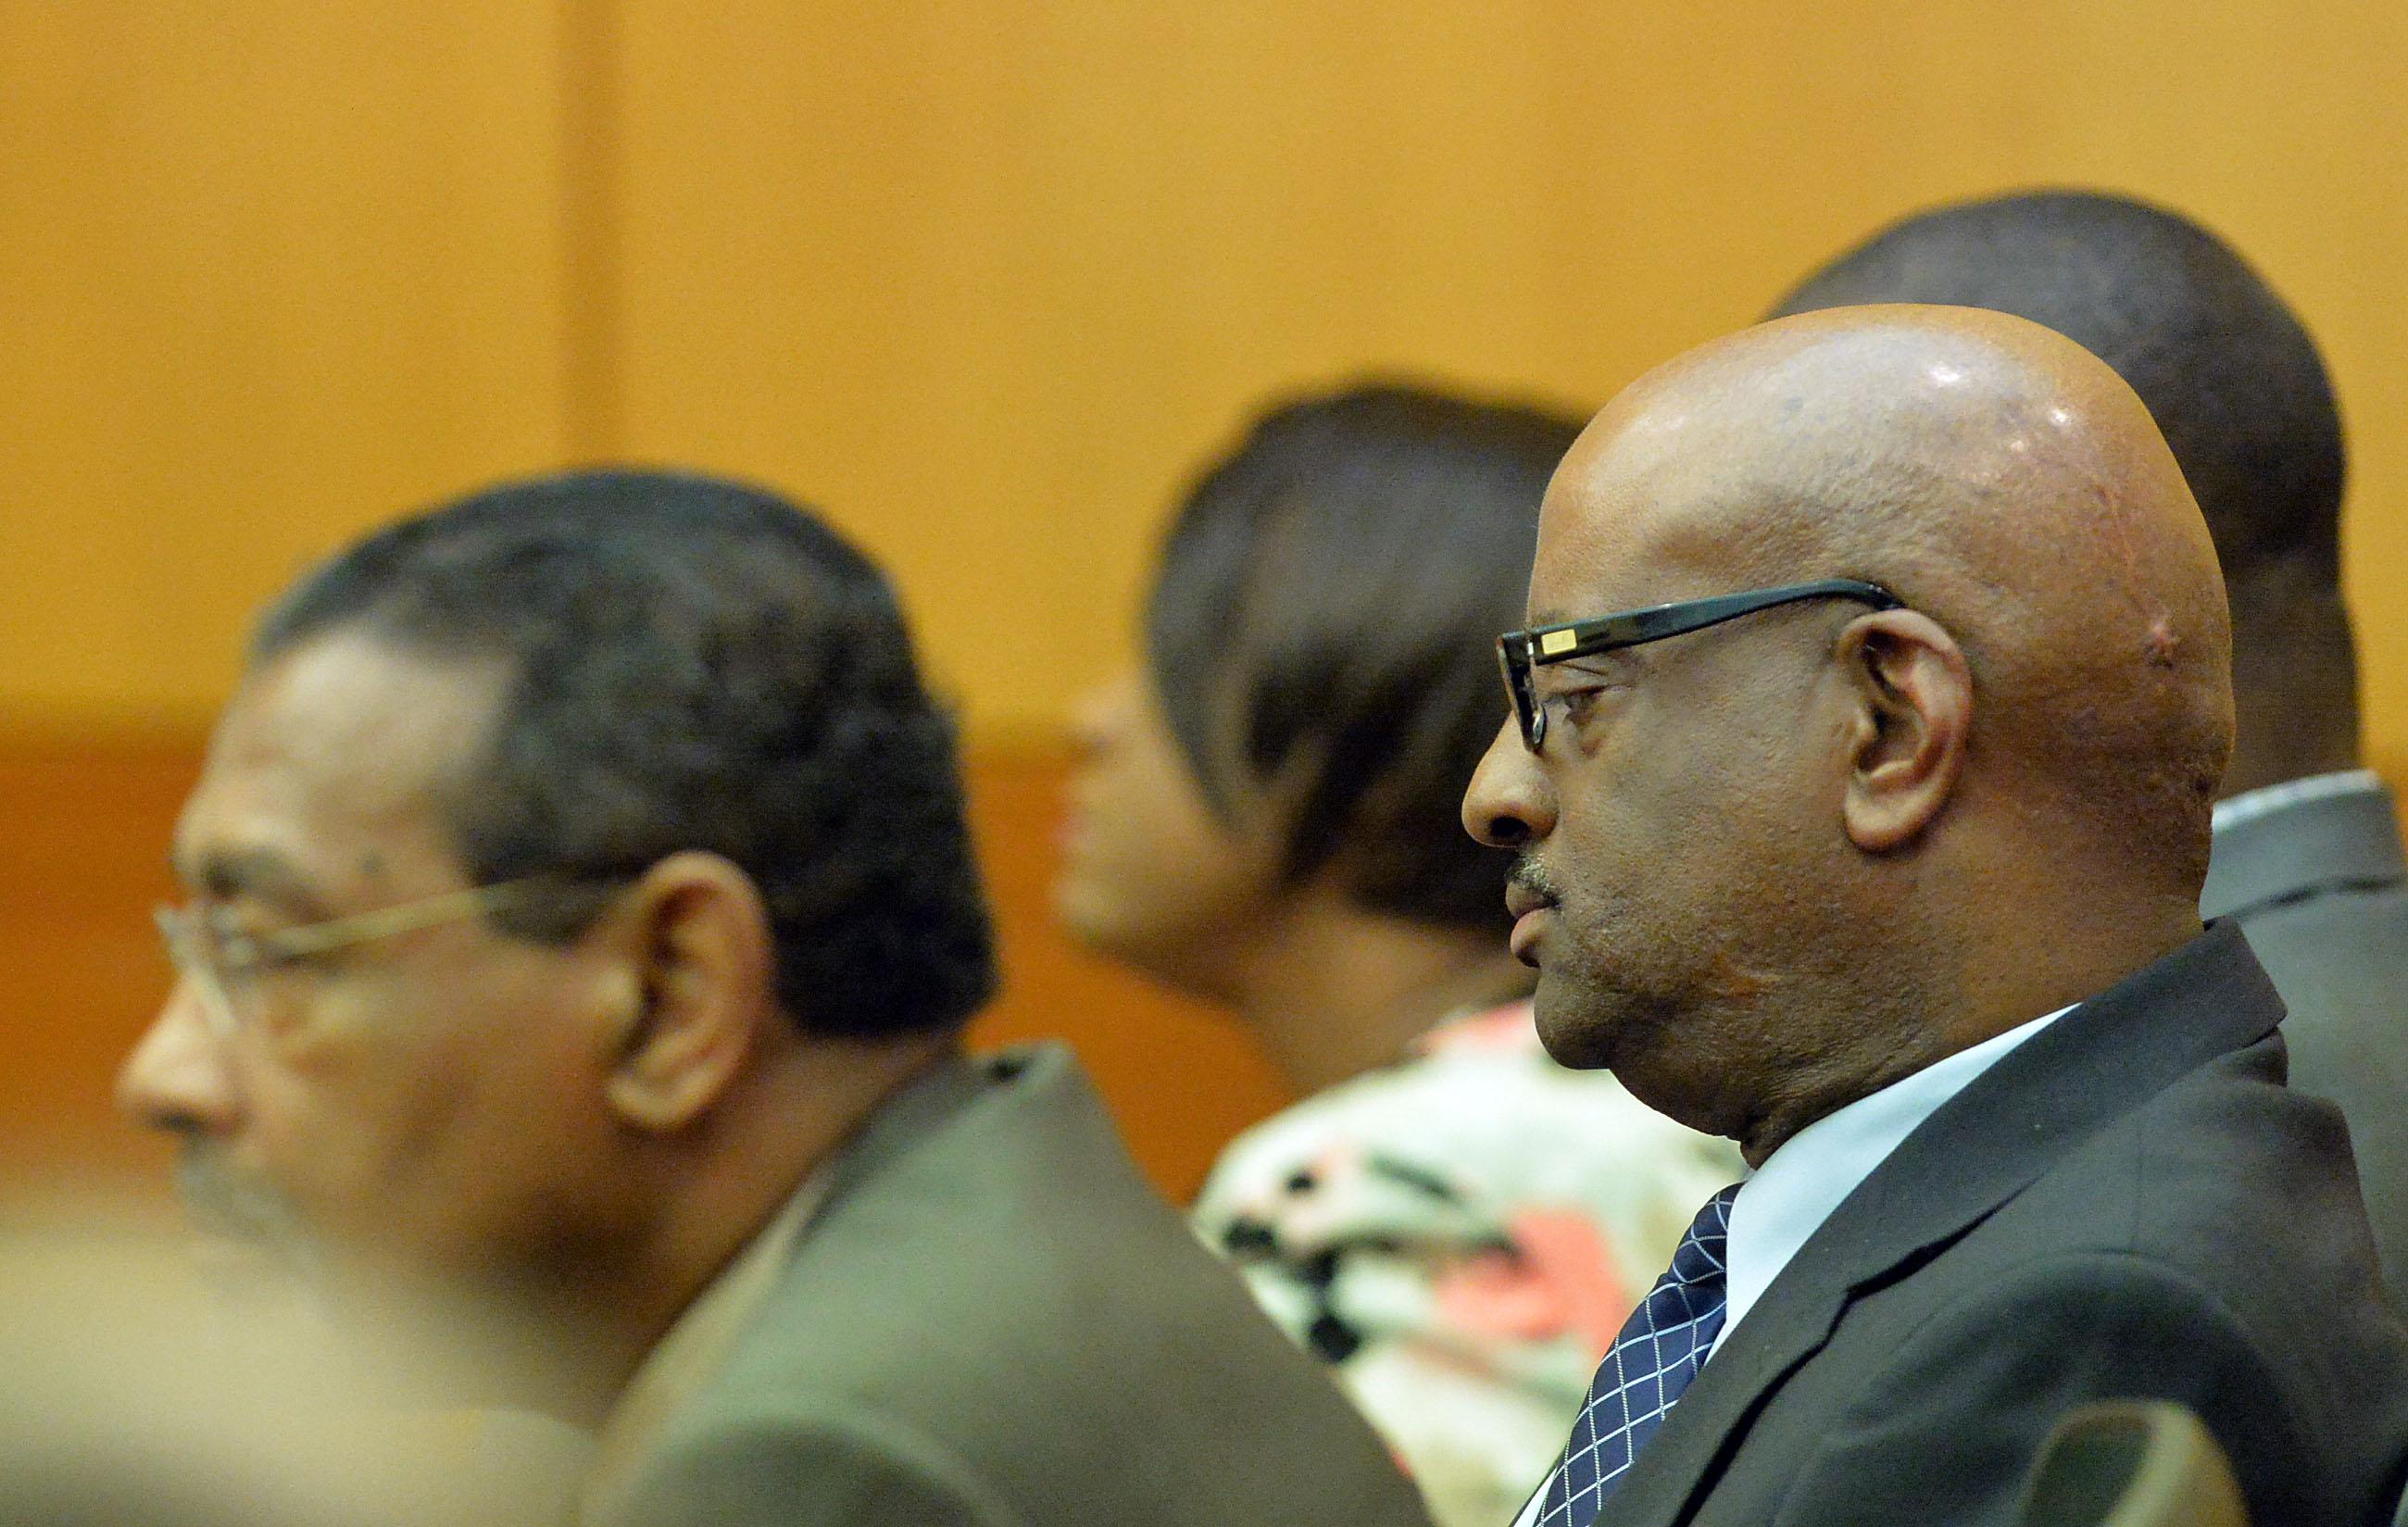 Cheating Case In Atlanta : Former atlanta educators jailed in test cheating scandal the blade